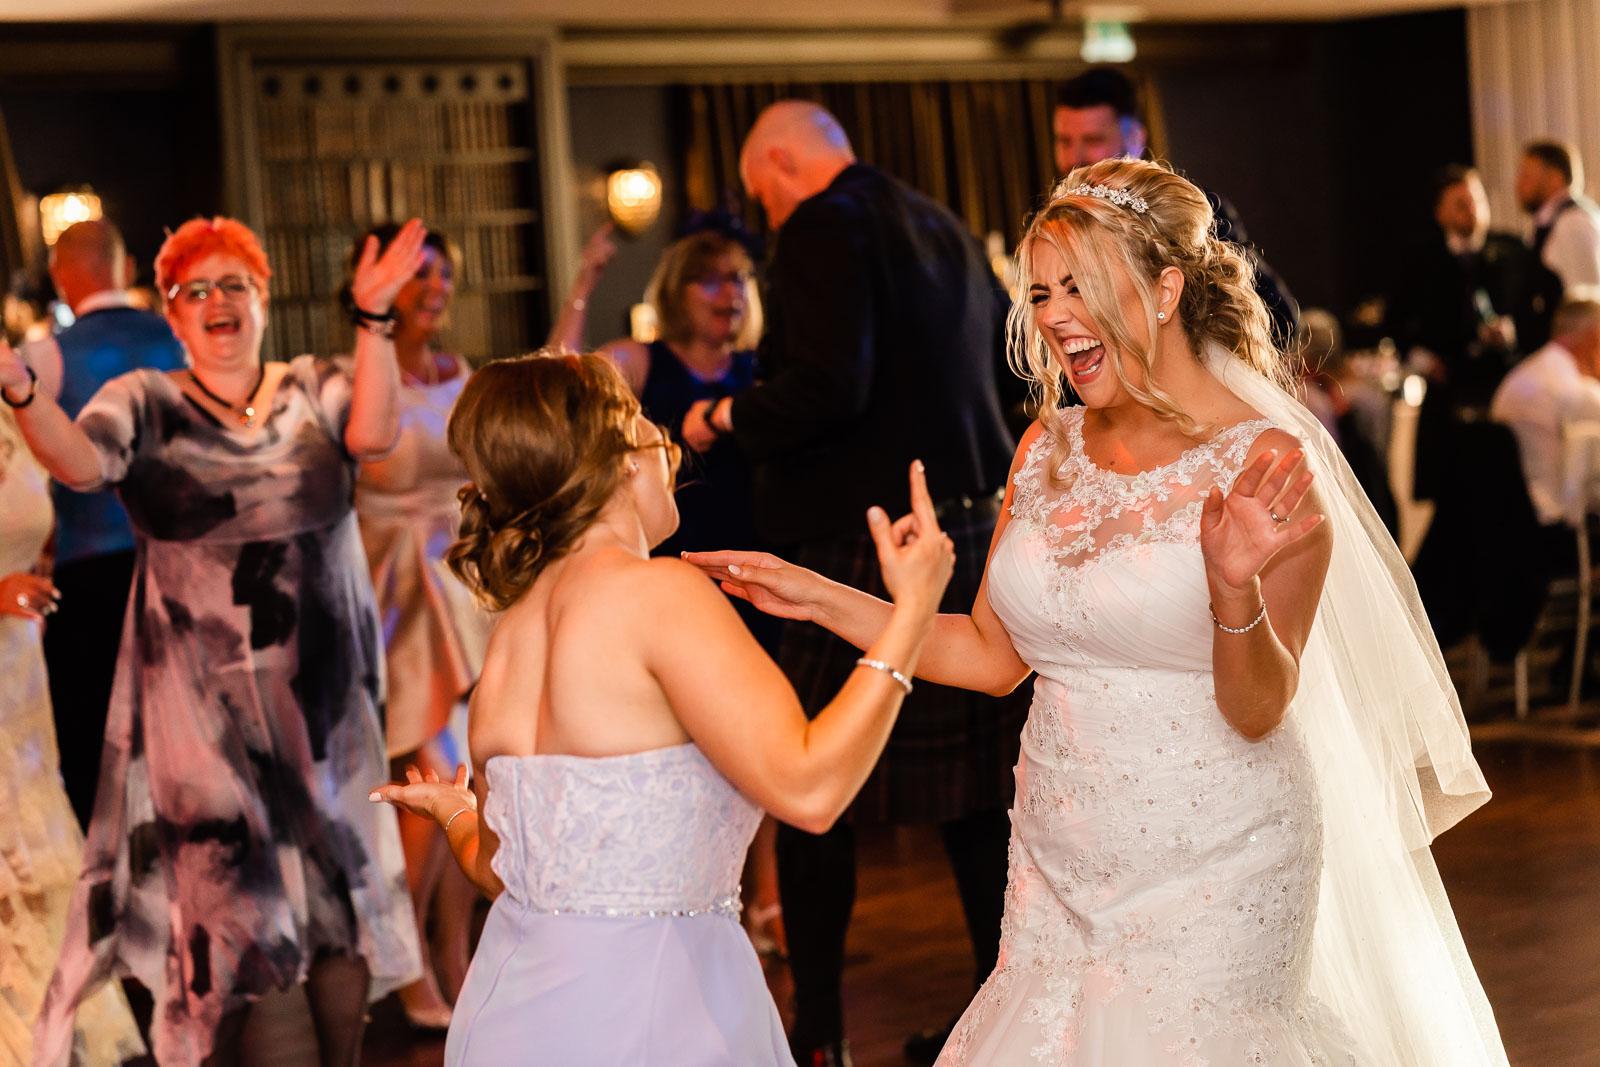 cornhill_castle_wedding_biggar_dearlyphotography (379 of 448).jpg